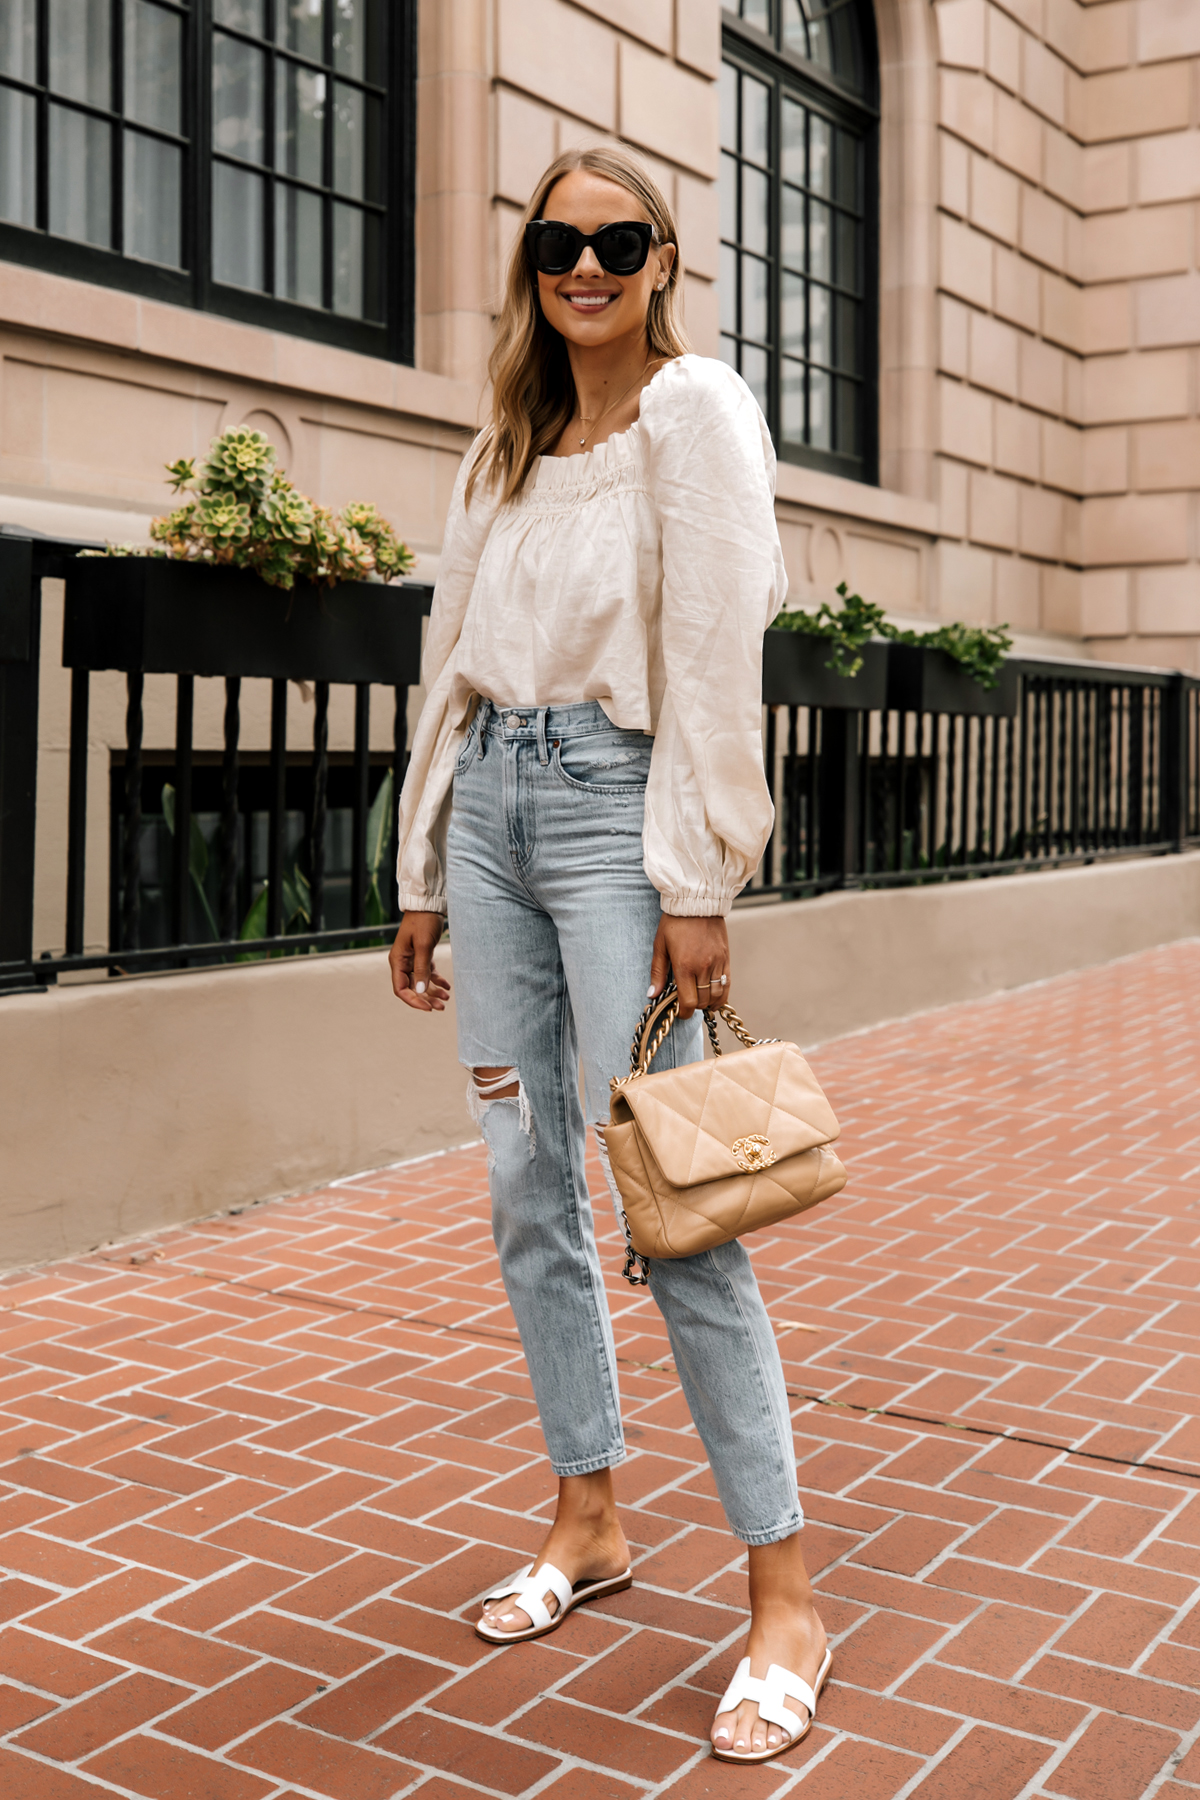 Fashion Jackson Wearing Beige Linen Puff Sleeve Top Madewell Ripped Jeans Hermes White Sandals Chanel 19 Beige Handbag 1